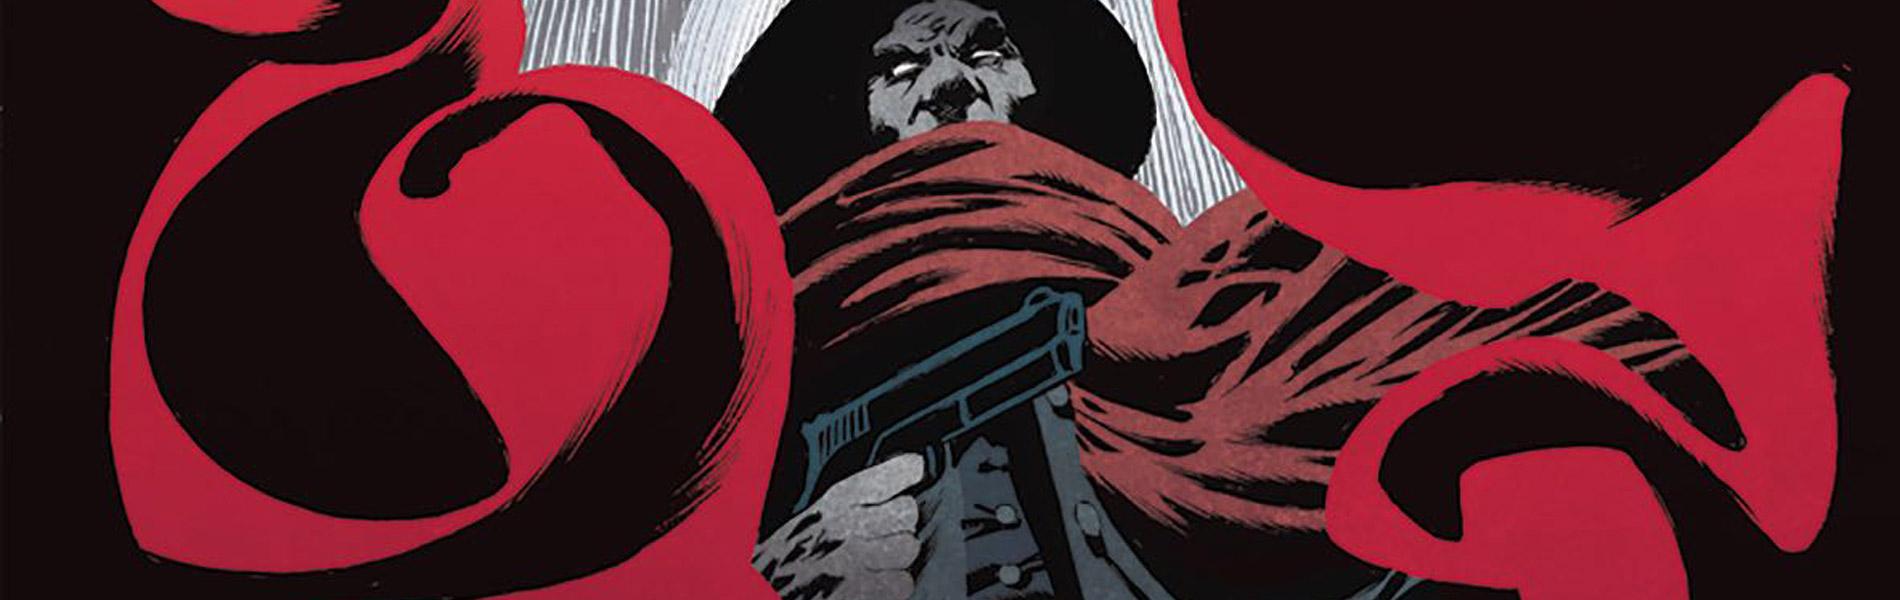 God of Comics – The Shadow #5